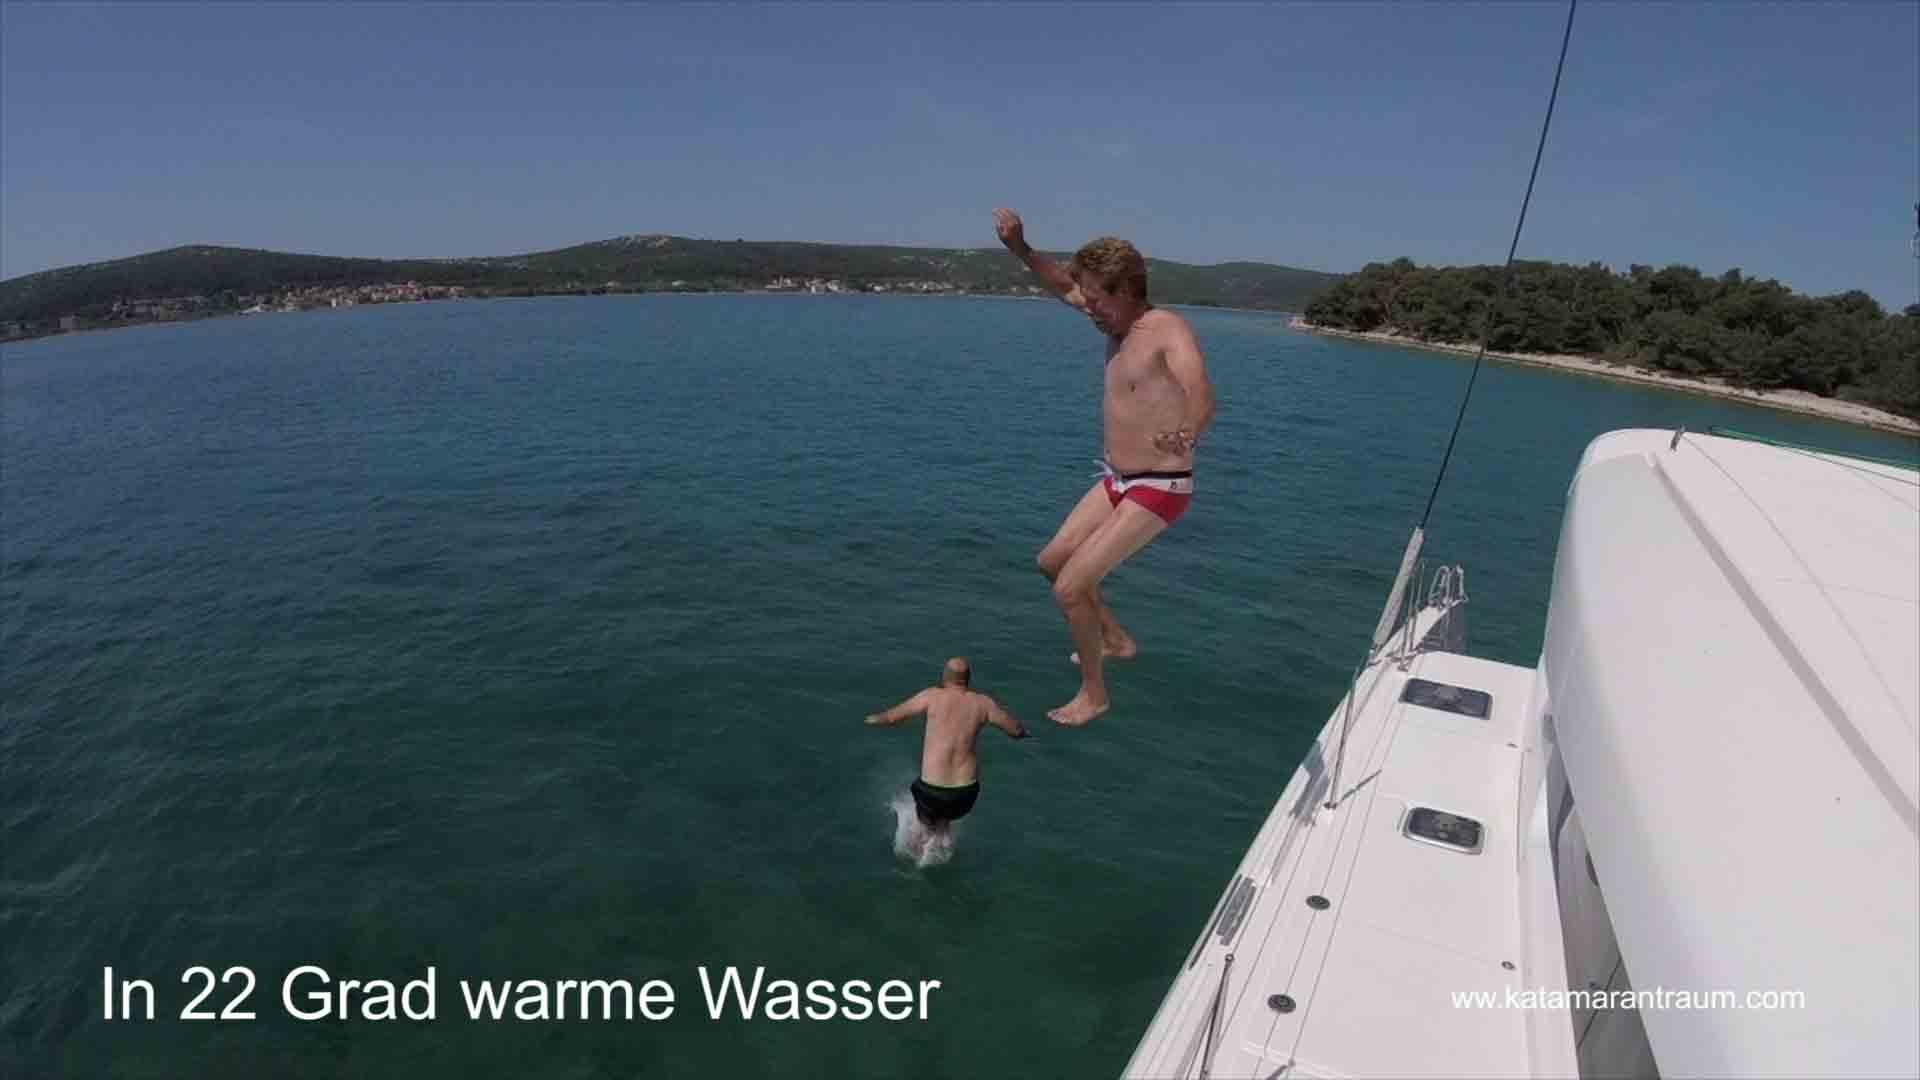 Skipper Jos and catamaran guest Attila go to sea